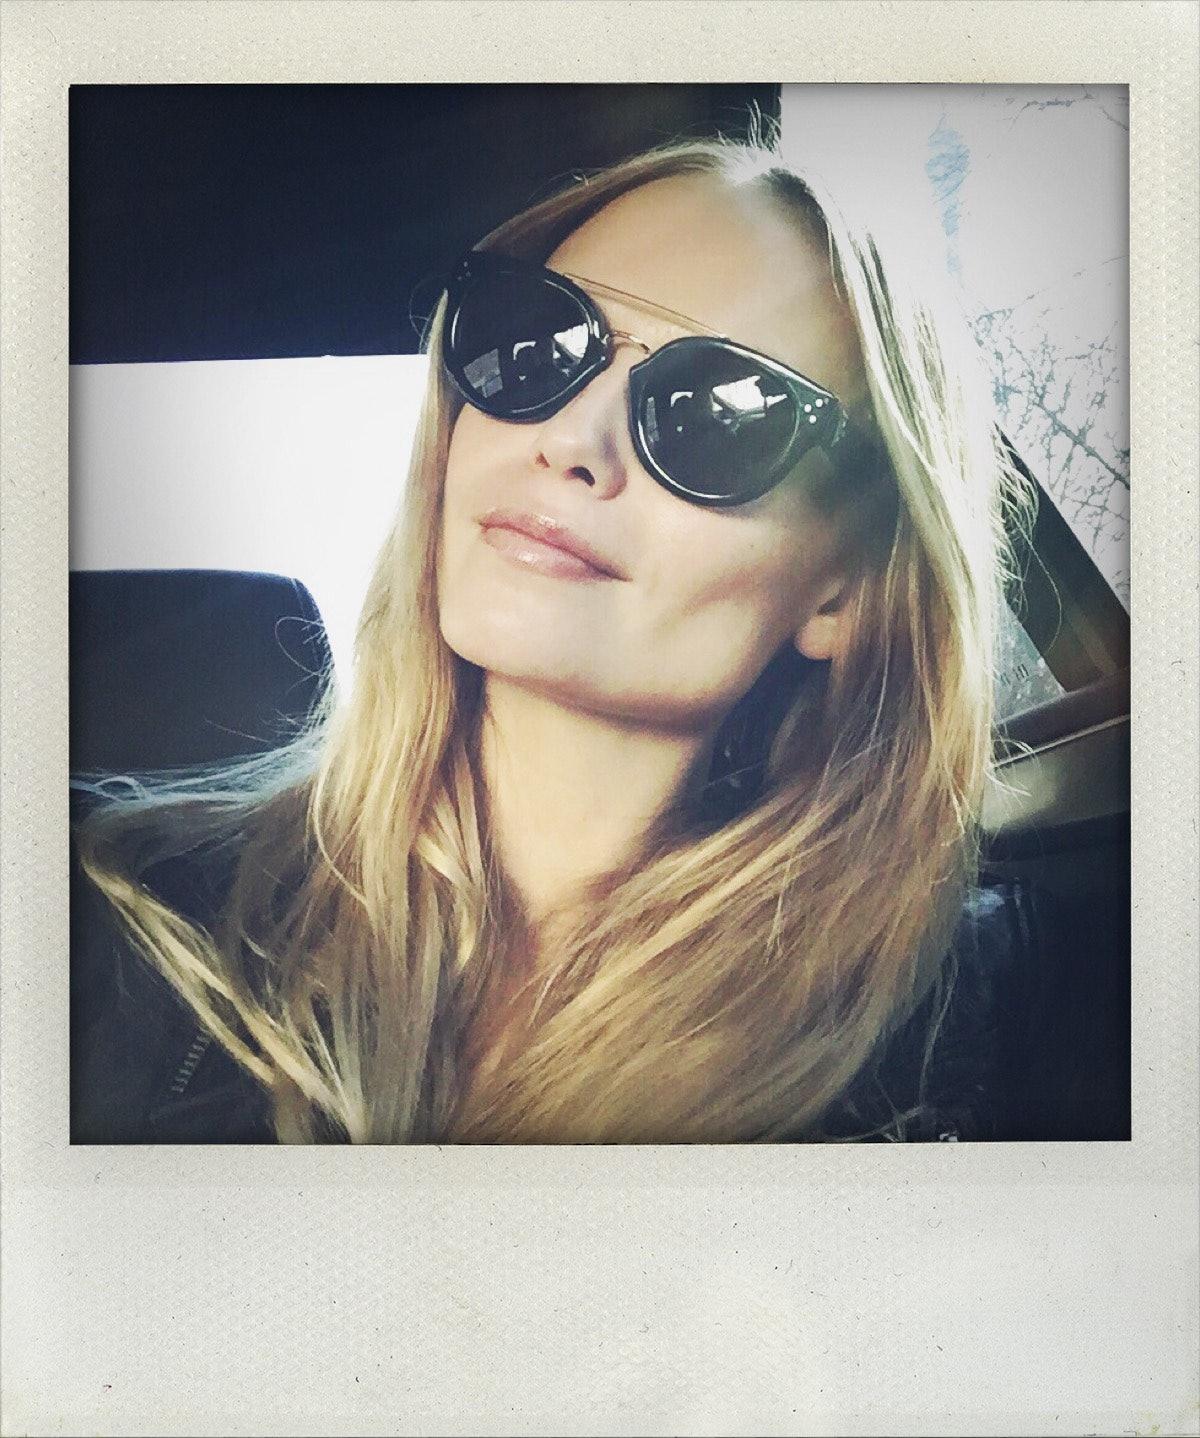 Natasha Poly Selfie